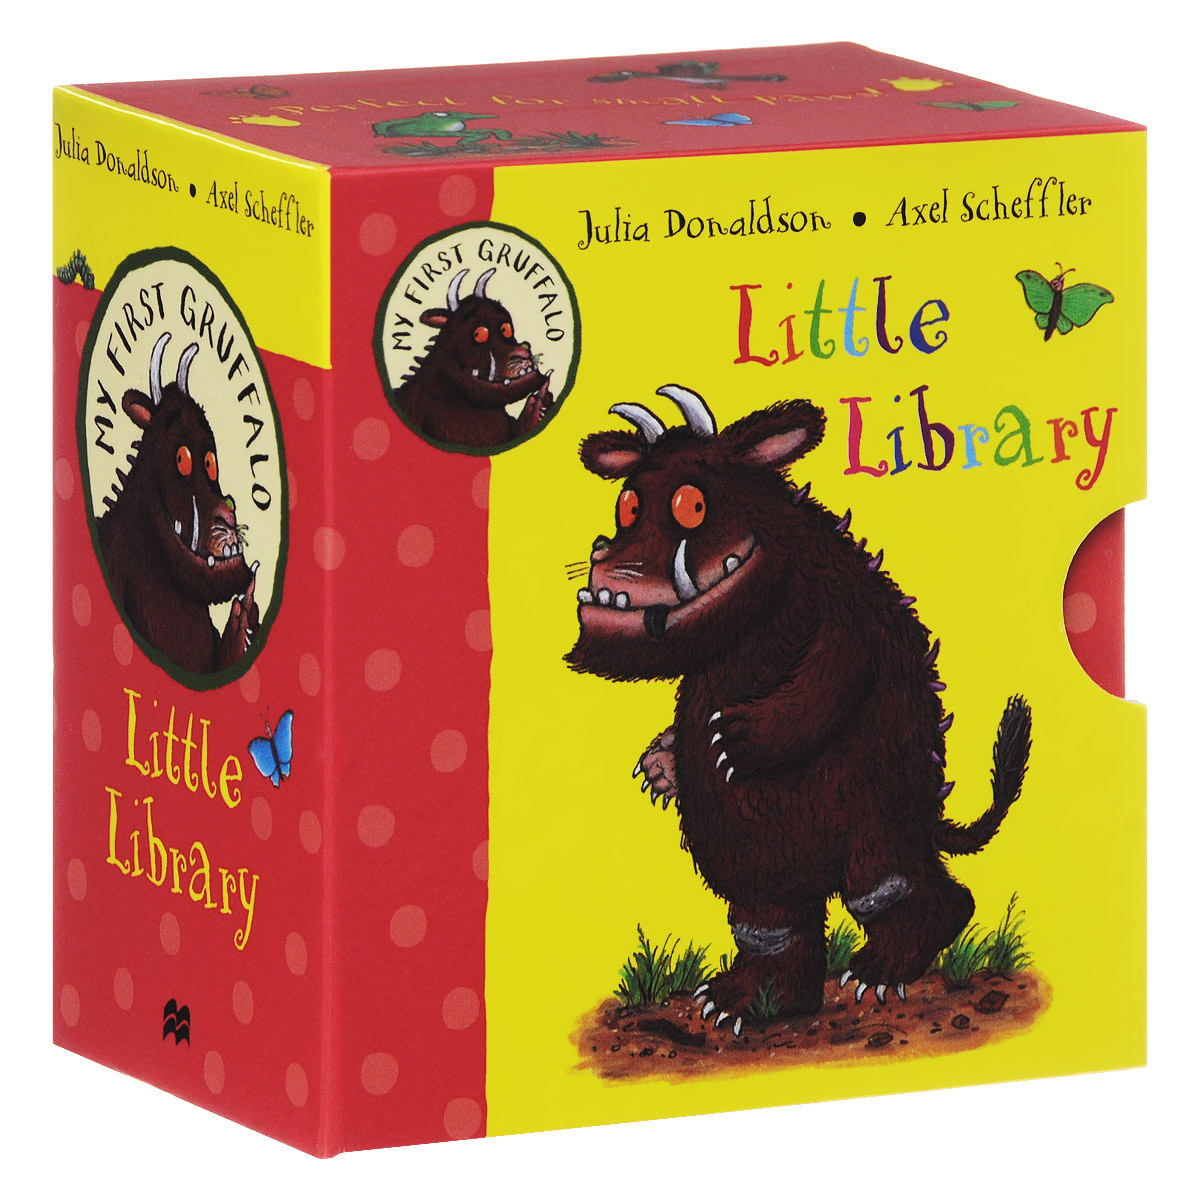 My First Gruffalo Little Library (комплект из 4 миниатюрных книжек) davis sarah sirett dawn my first learning library box my first world abc numbers hb